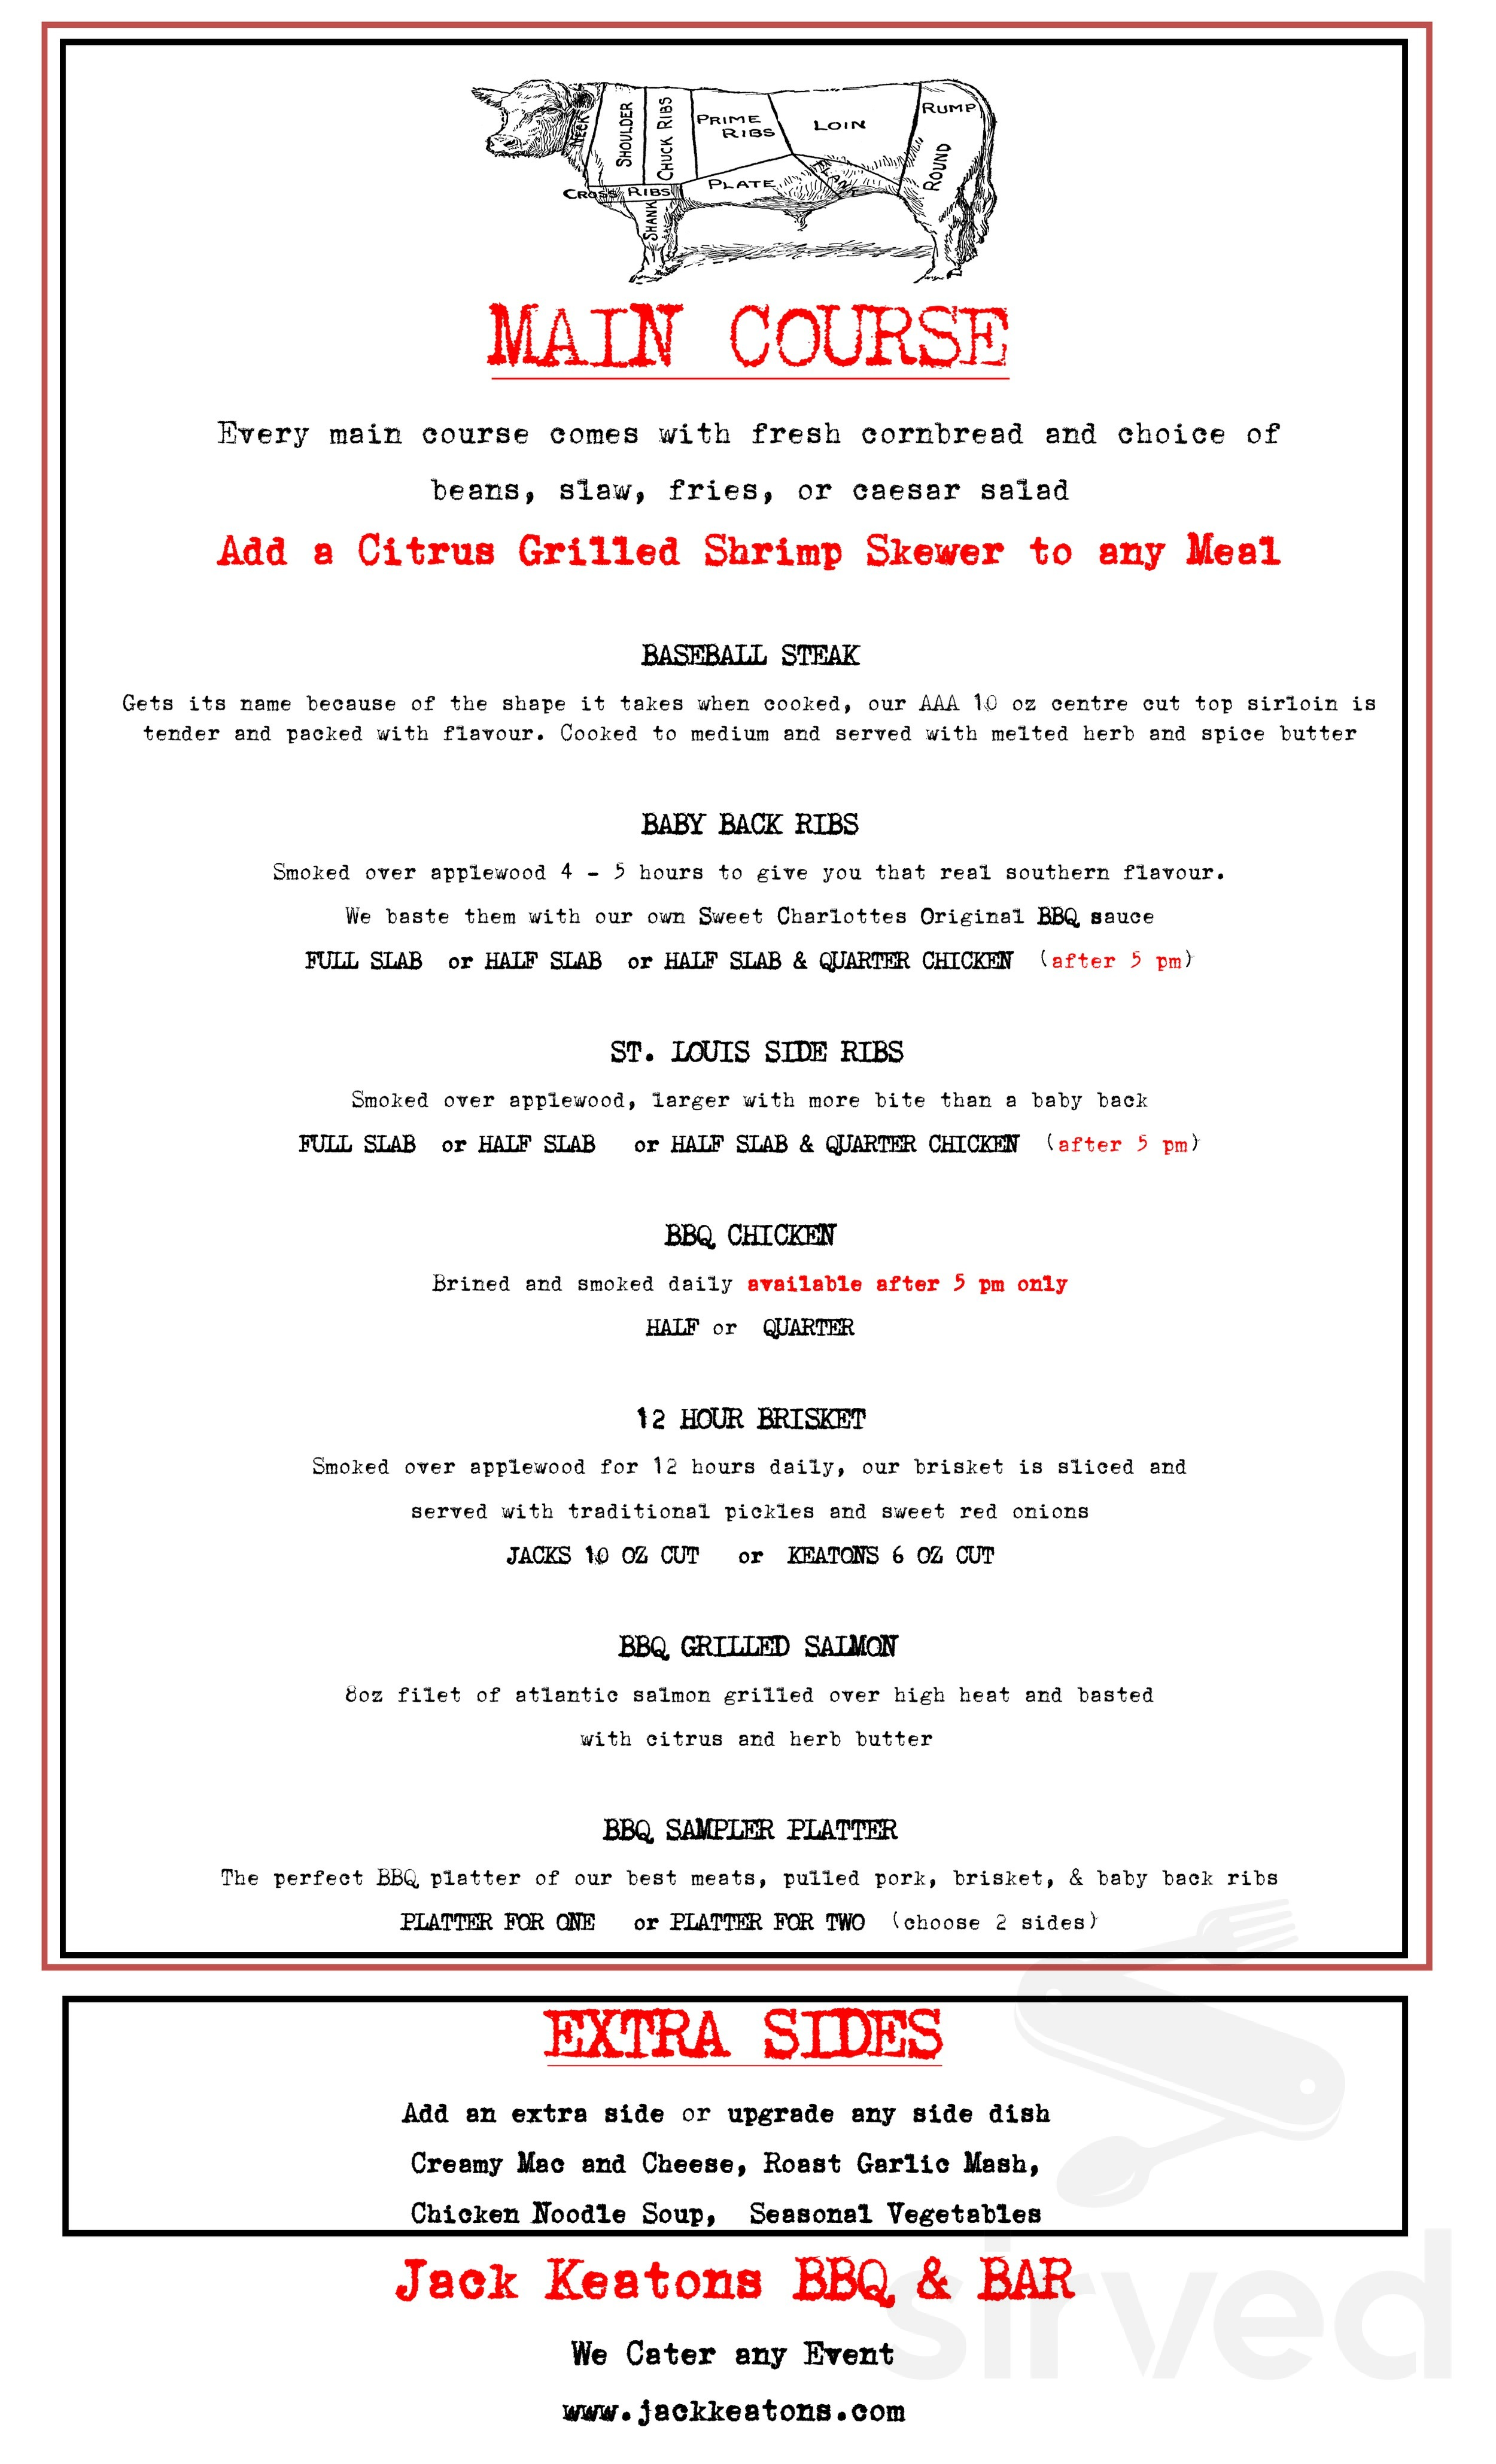 Menu for Jack Keaton's BBQ & BAR in Regina, Saskatchewan